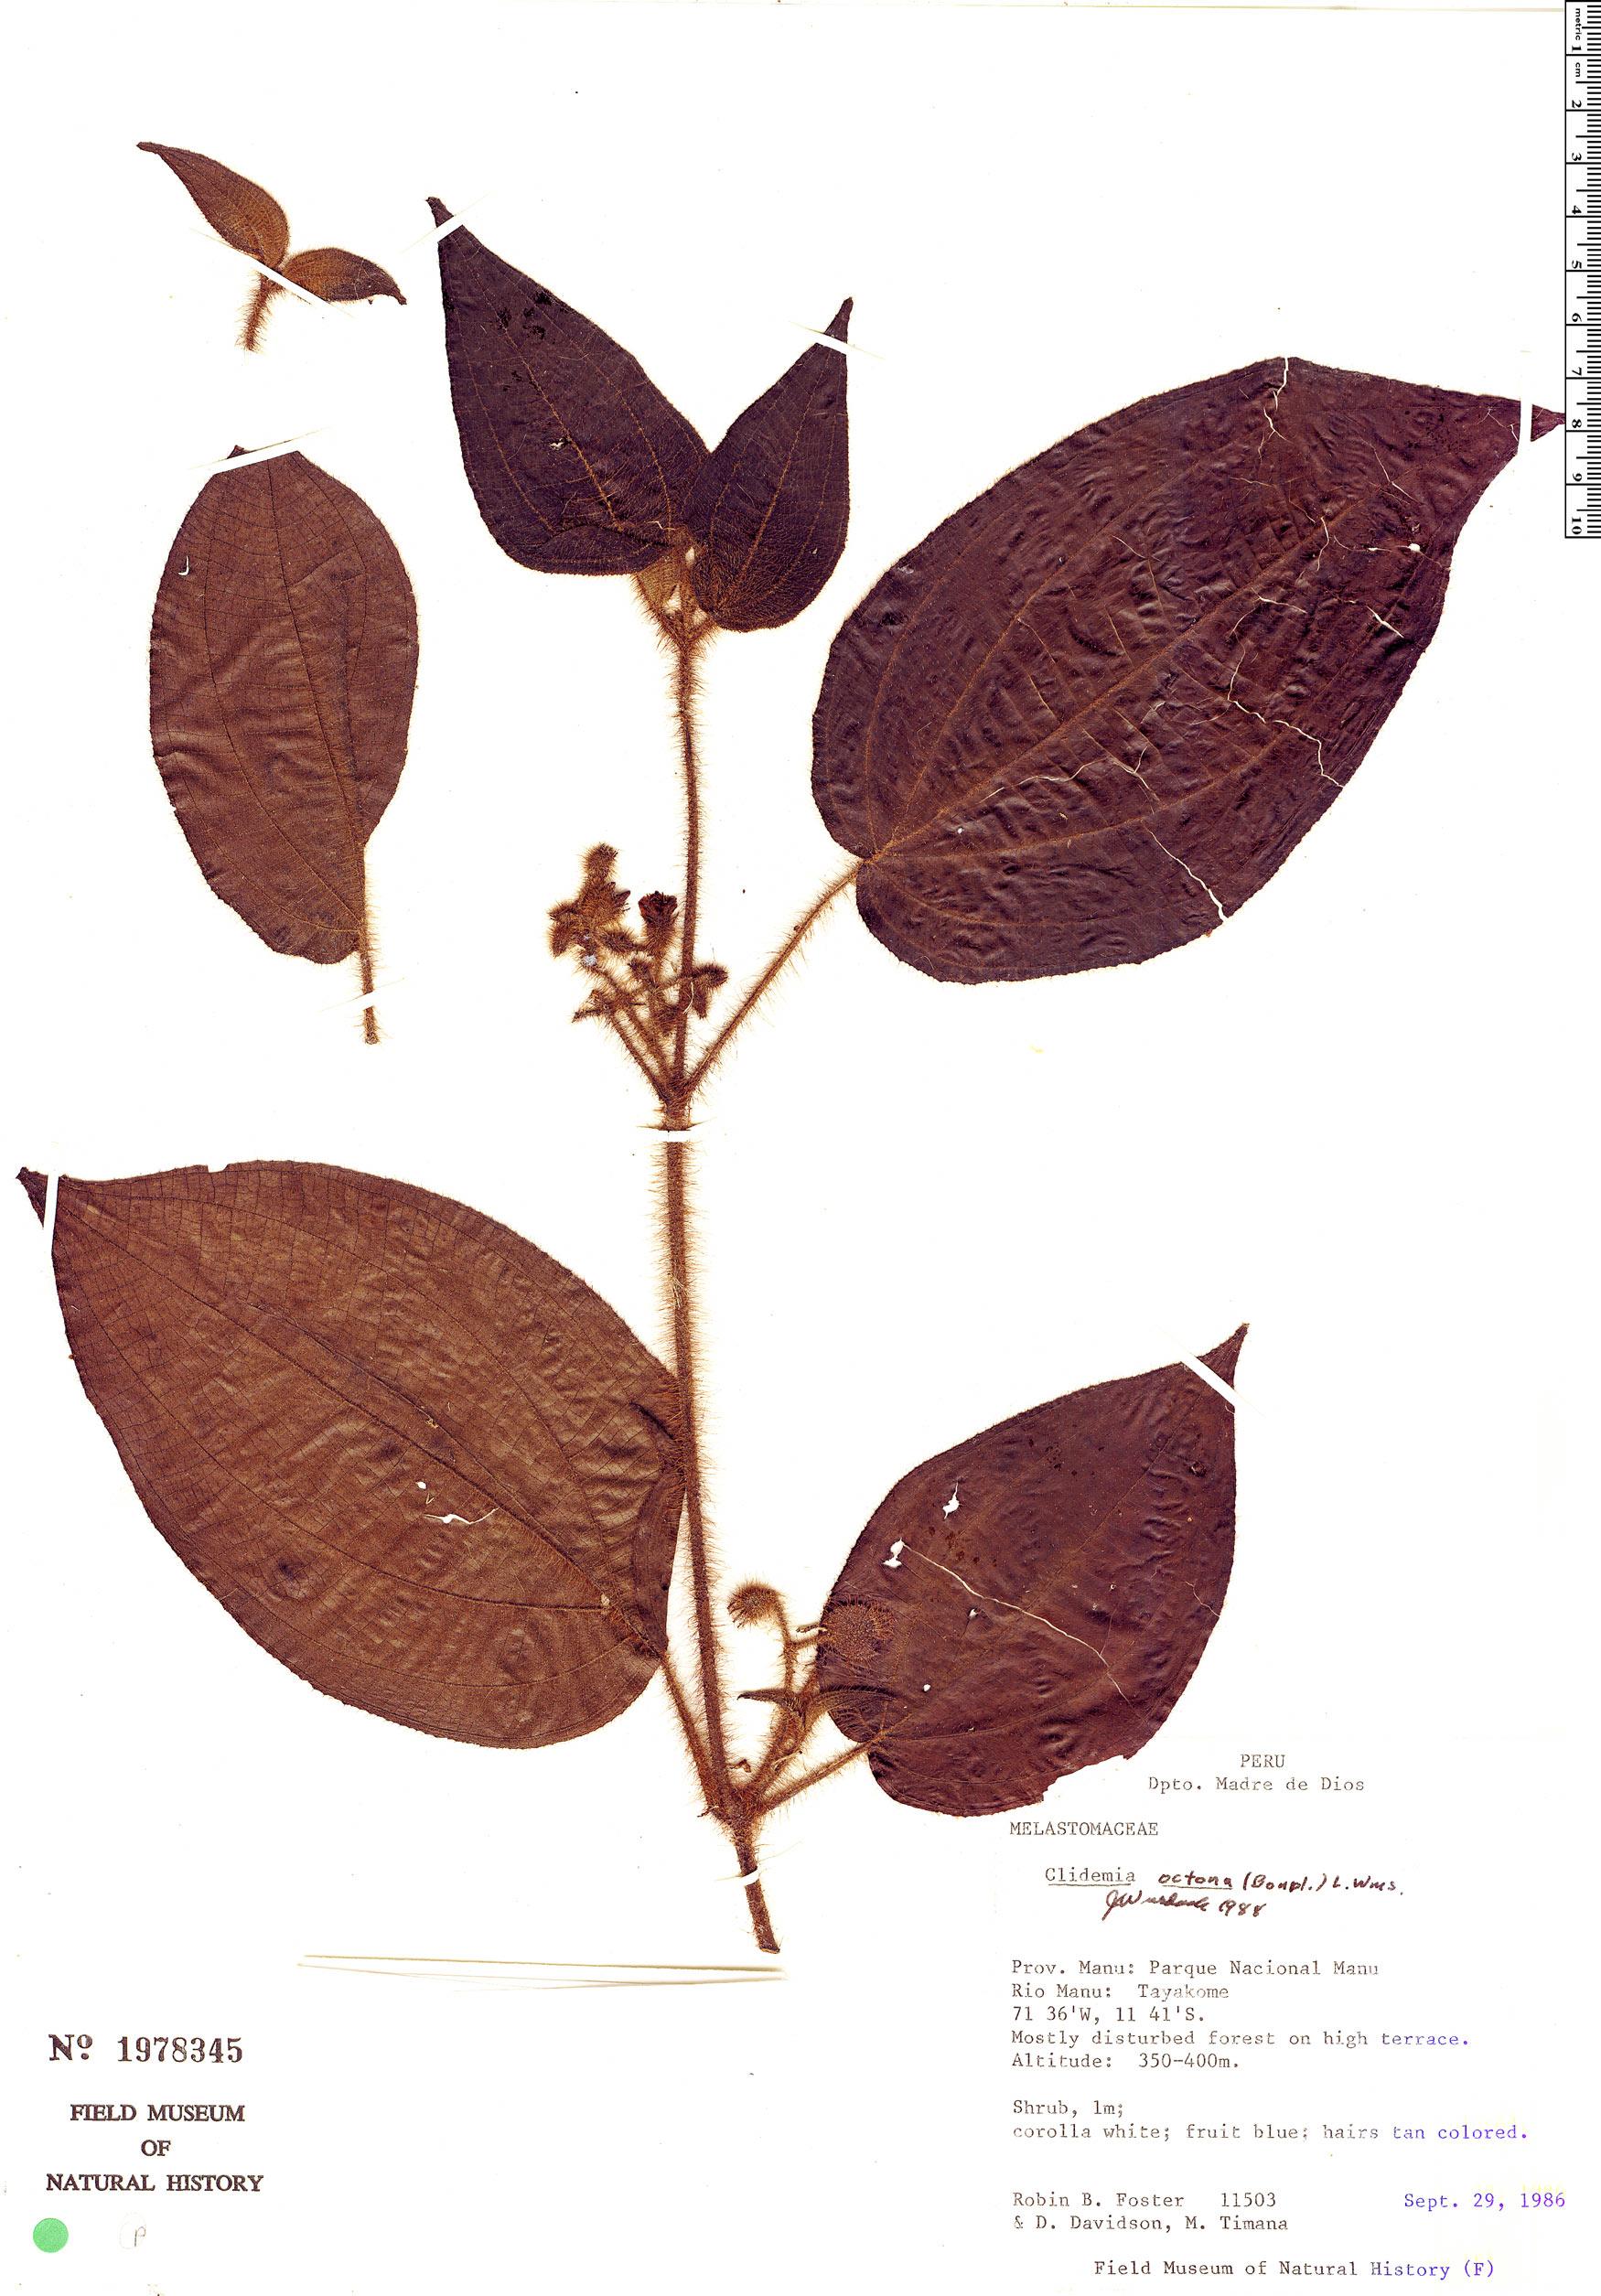 Specimen: Clidemia octona